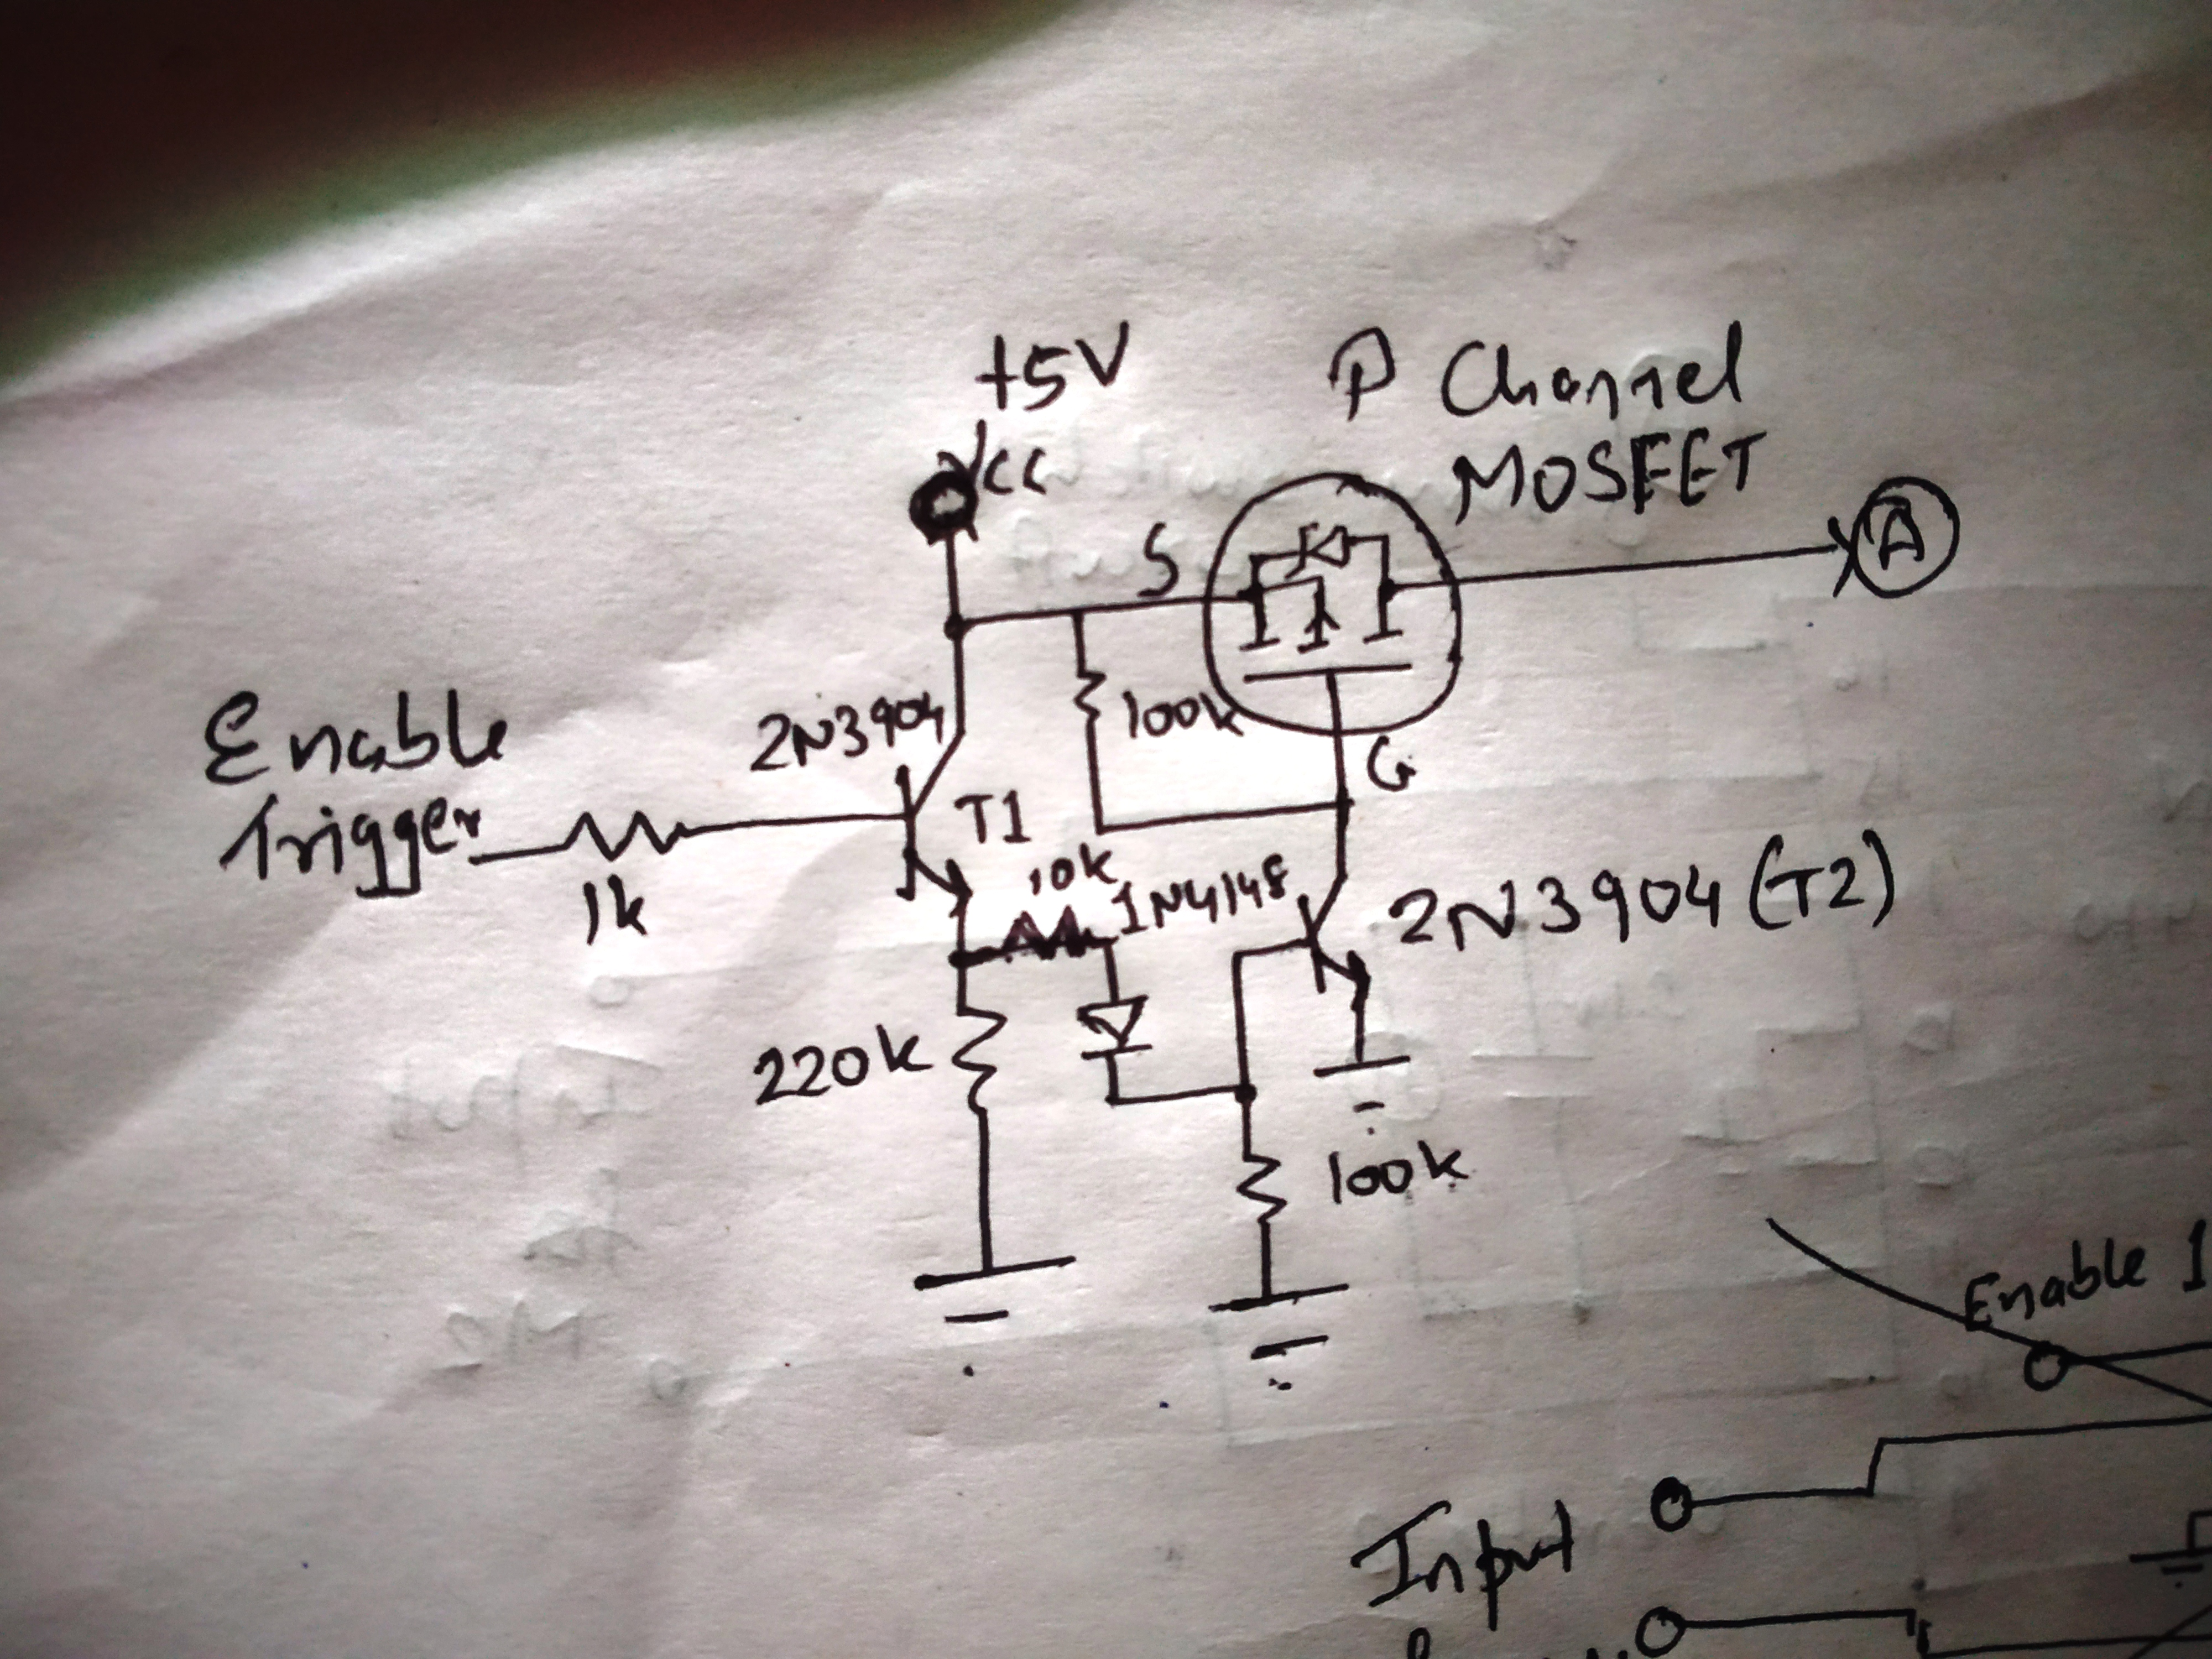 Power switching circuit hfzoxiolni